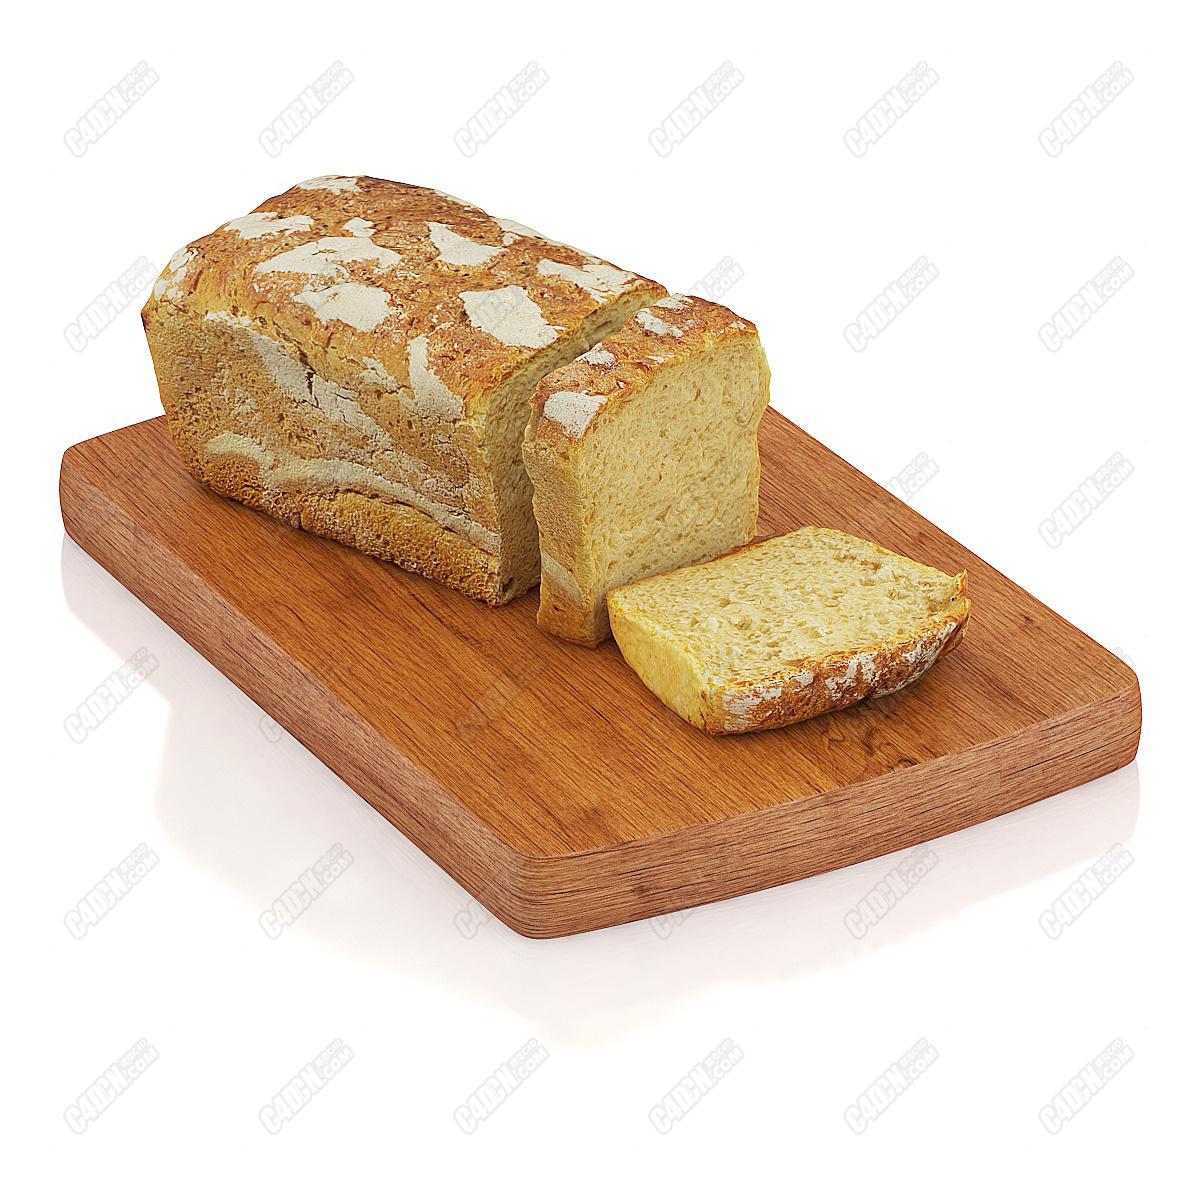 C4D模型-切片面包模型(包含材質和貼圖) Sliced bread model